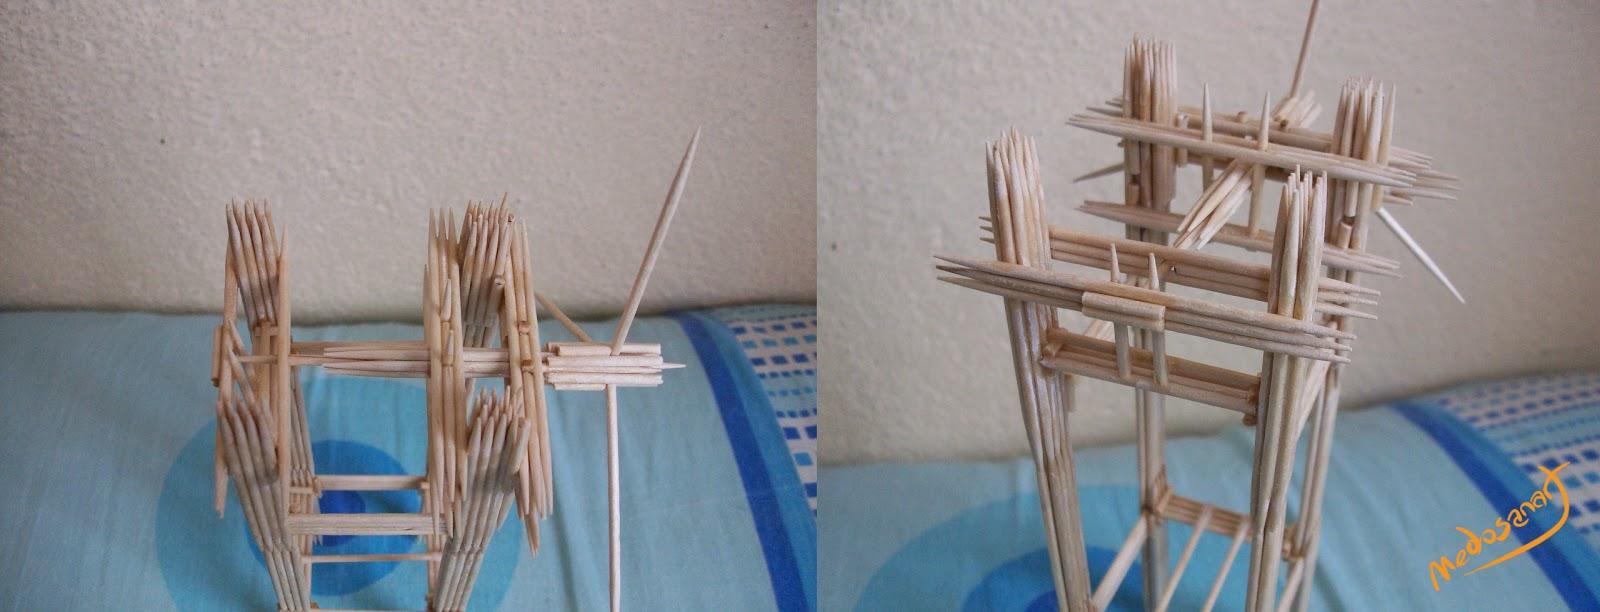 Kürdandan kalemlik - medosanart